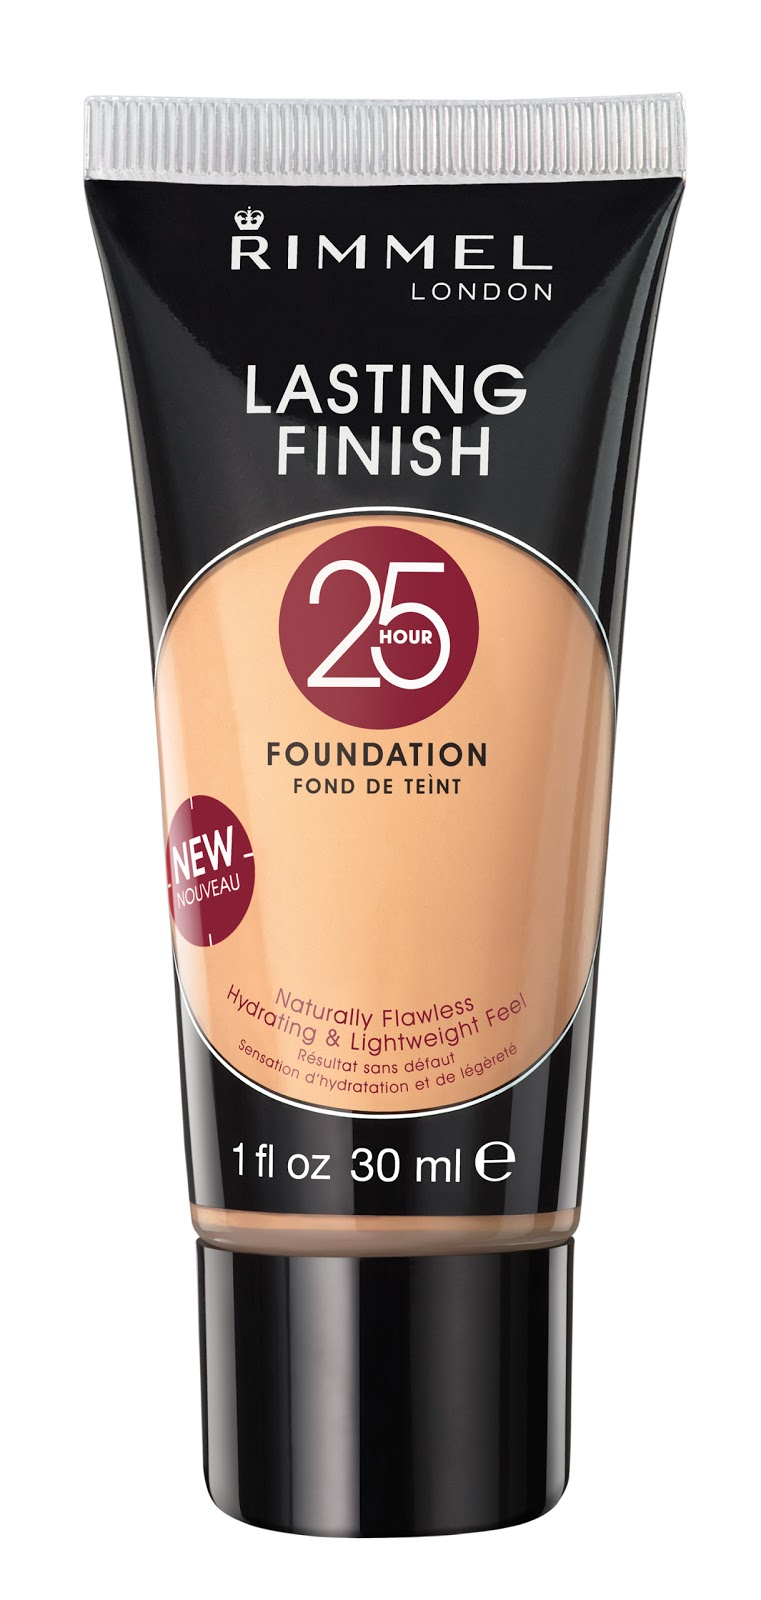 Review: Rimmel London Lasting Finish 25 Hour Foundation